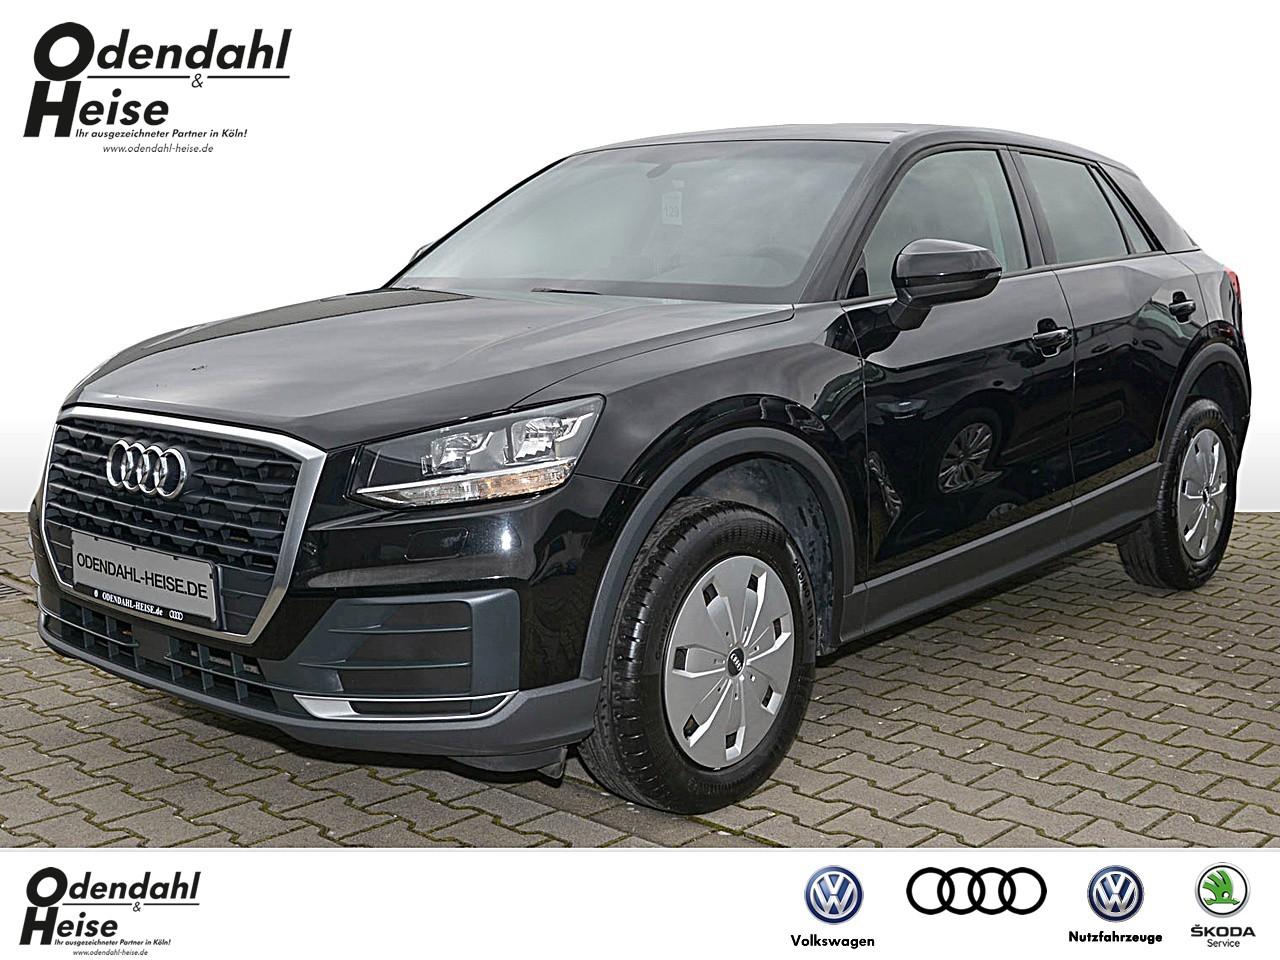 Audi Q2 1,6 l TDI EU6 Klima Navi Einparkhilfe, Jahr 2018, Diesel